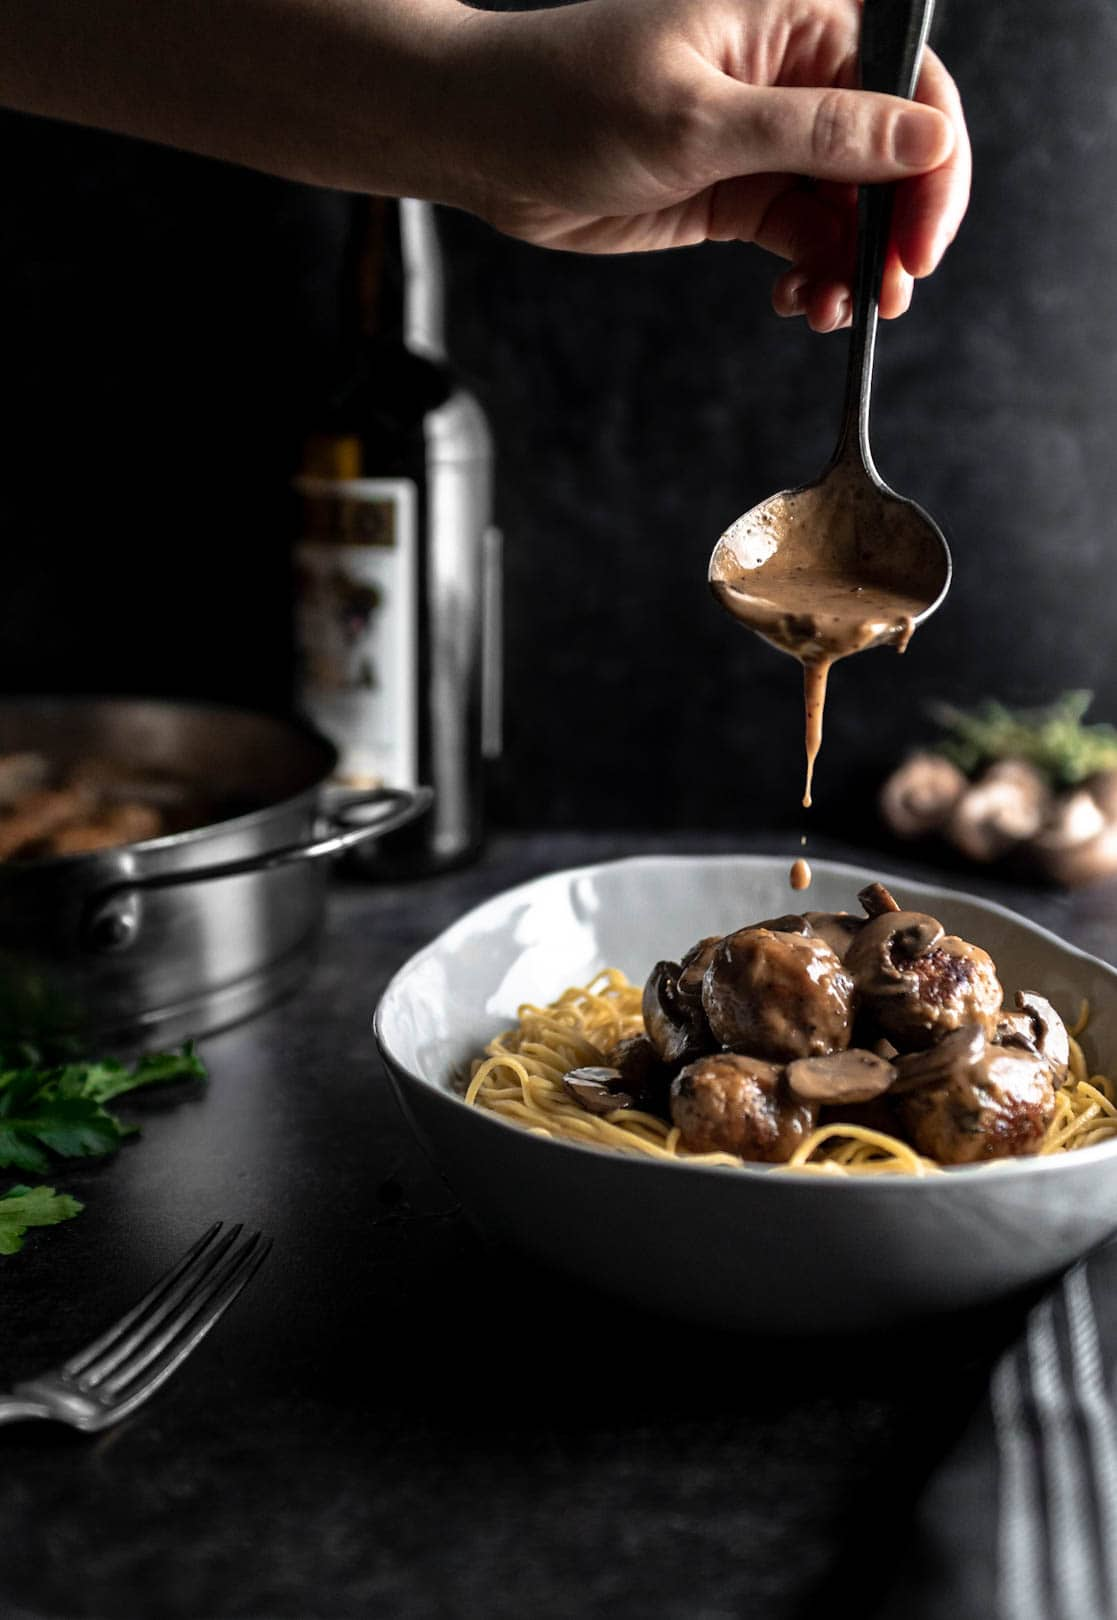 Marsala cream sauce being poured over chicken mushroom meatballs